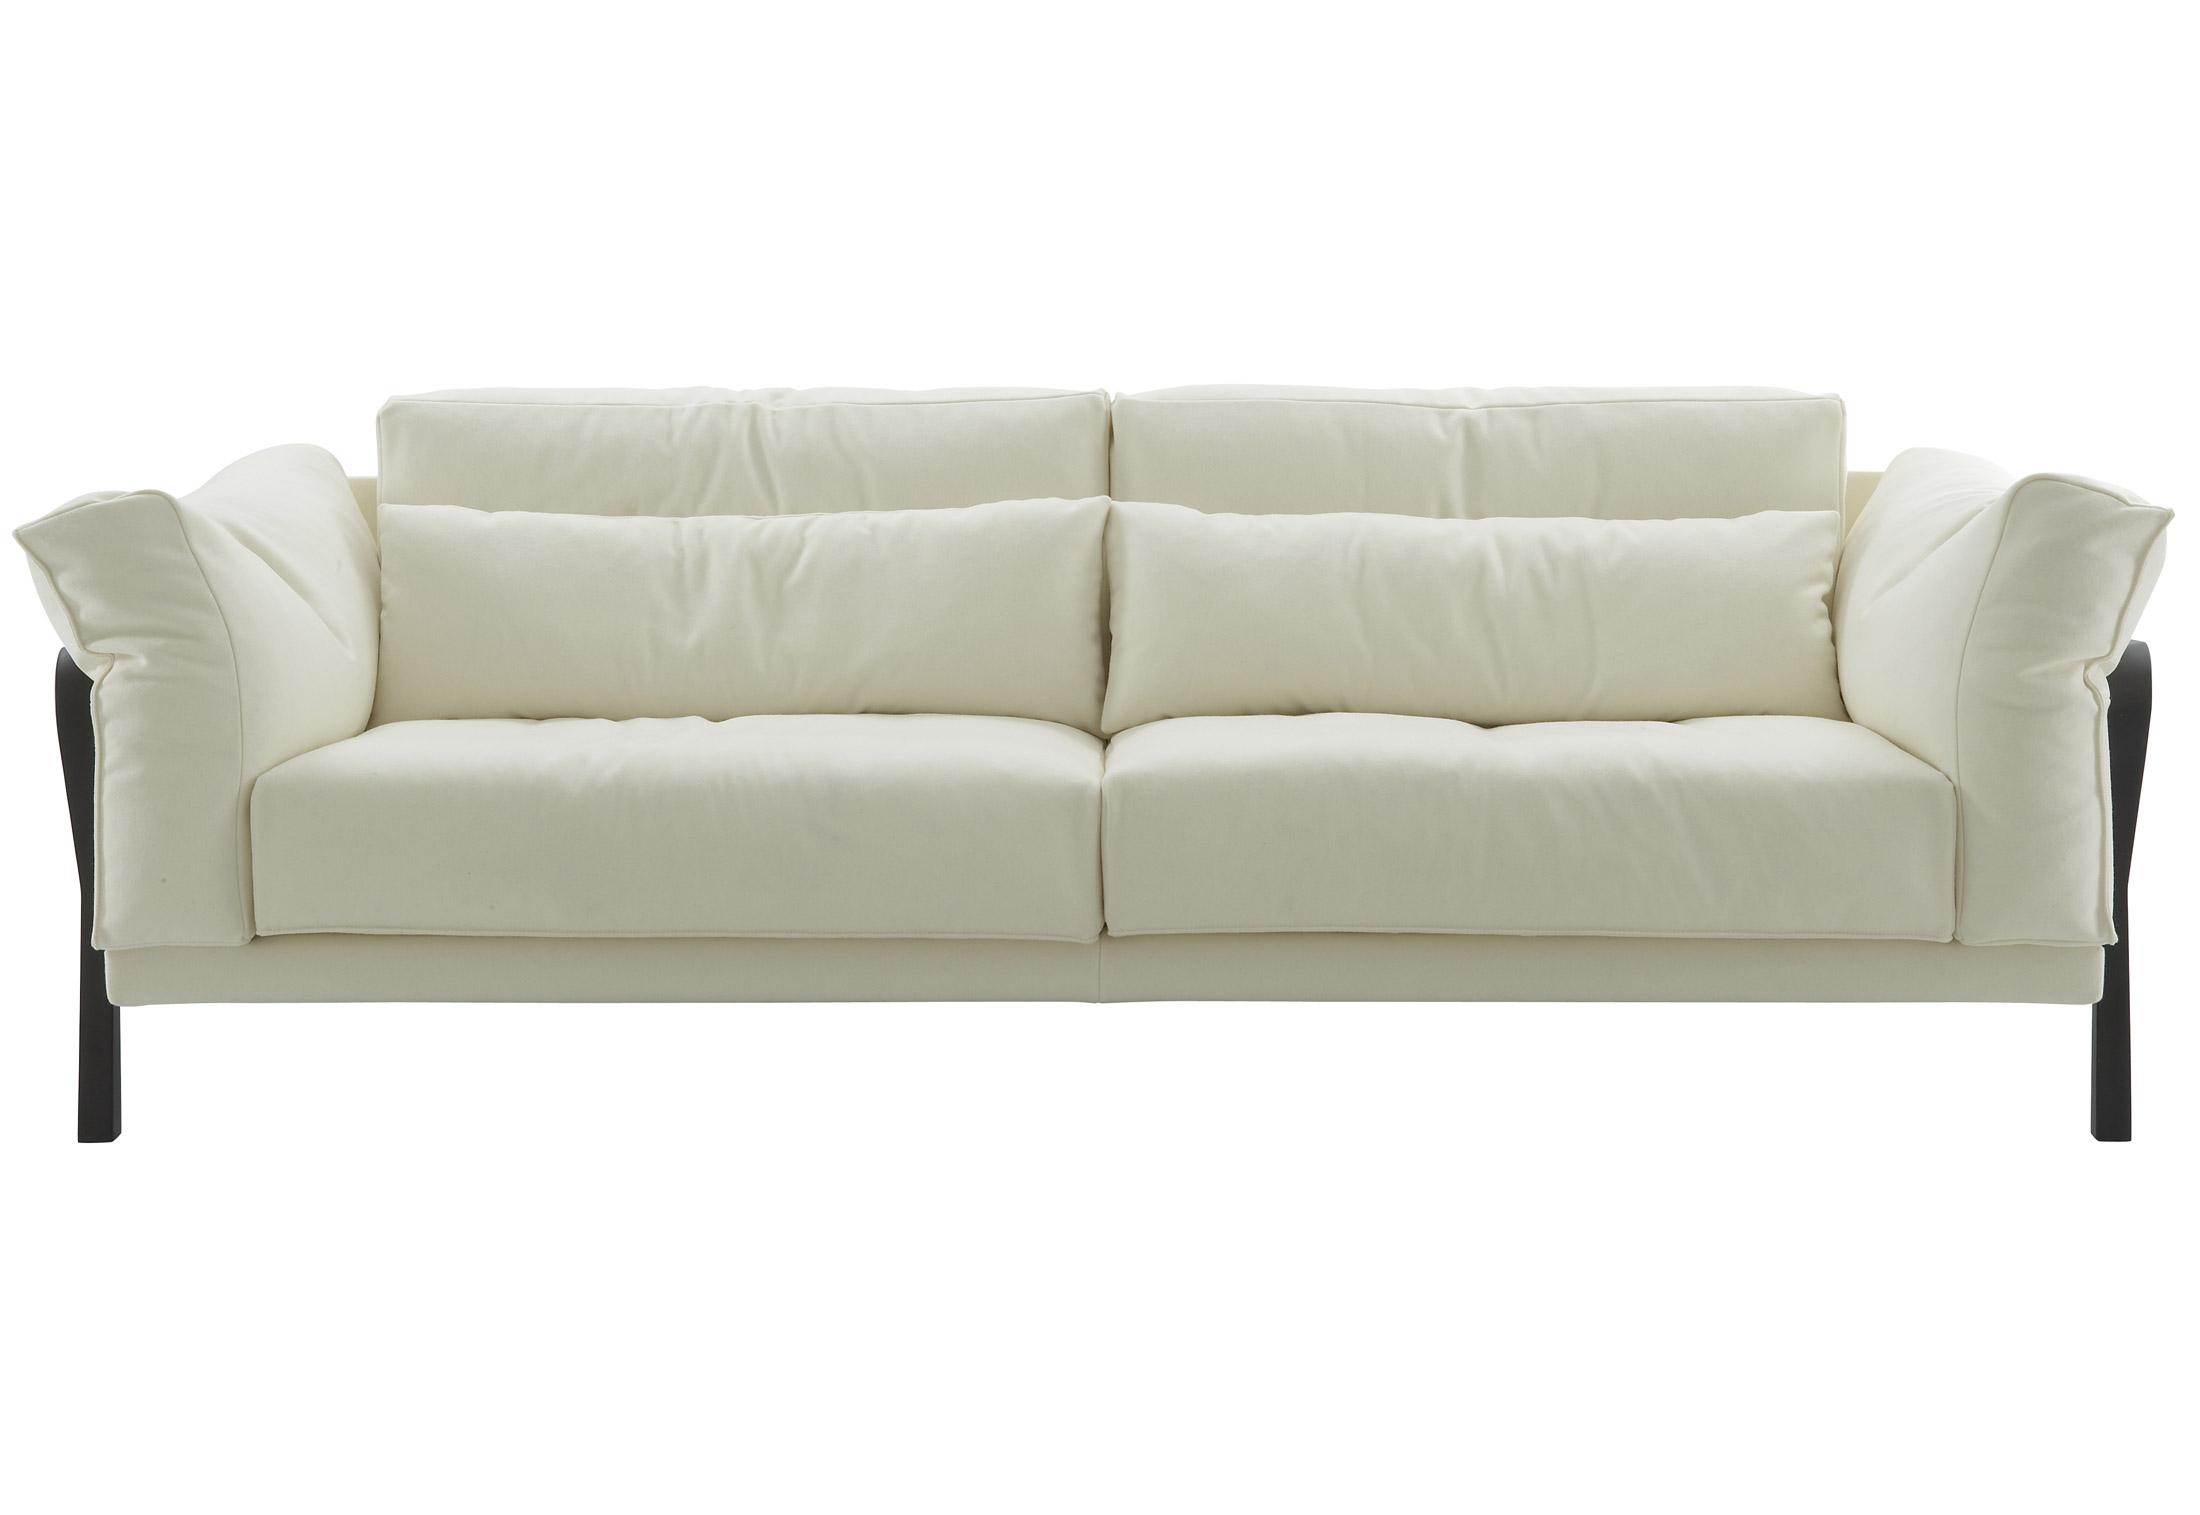 Sofa gezeichnet  CITYLOFT Sofa von ligne roset | STYLEPARK